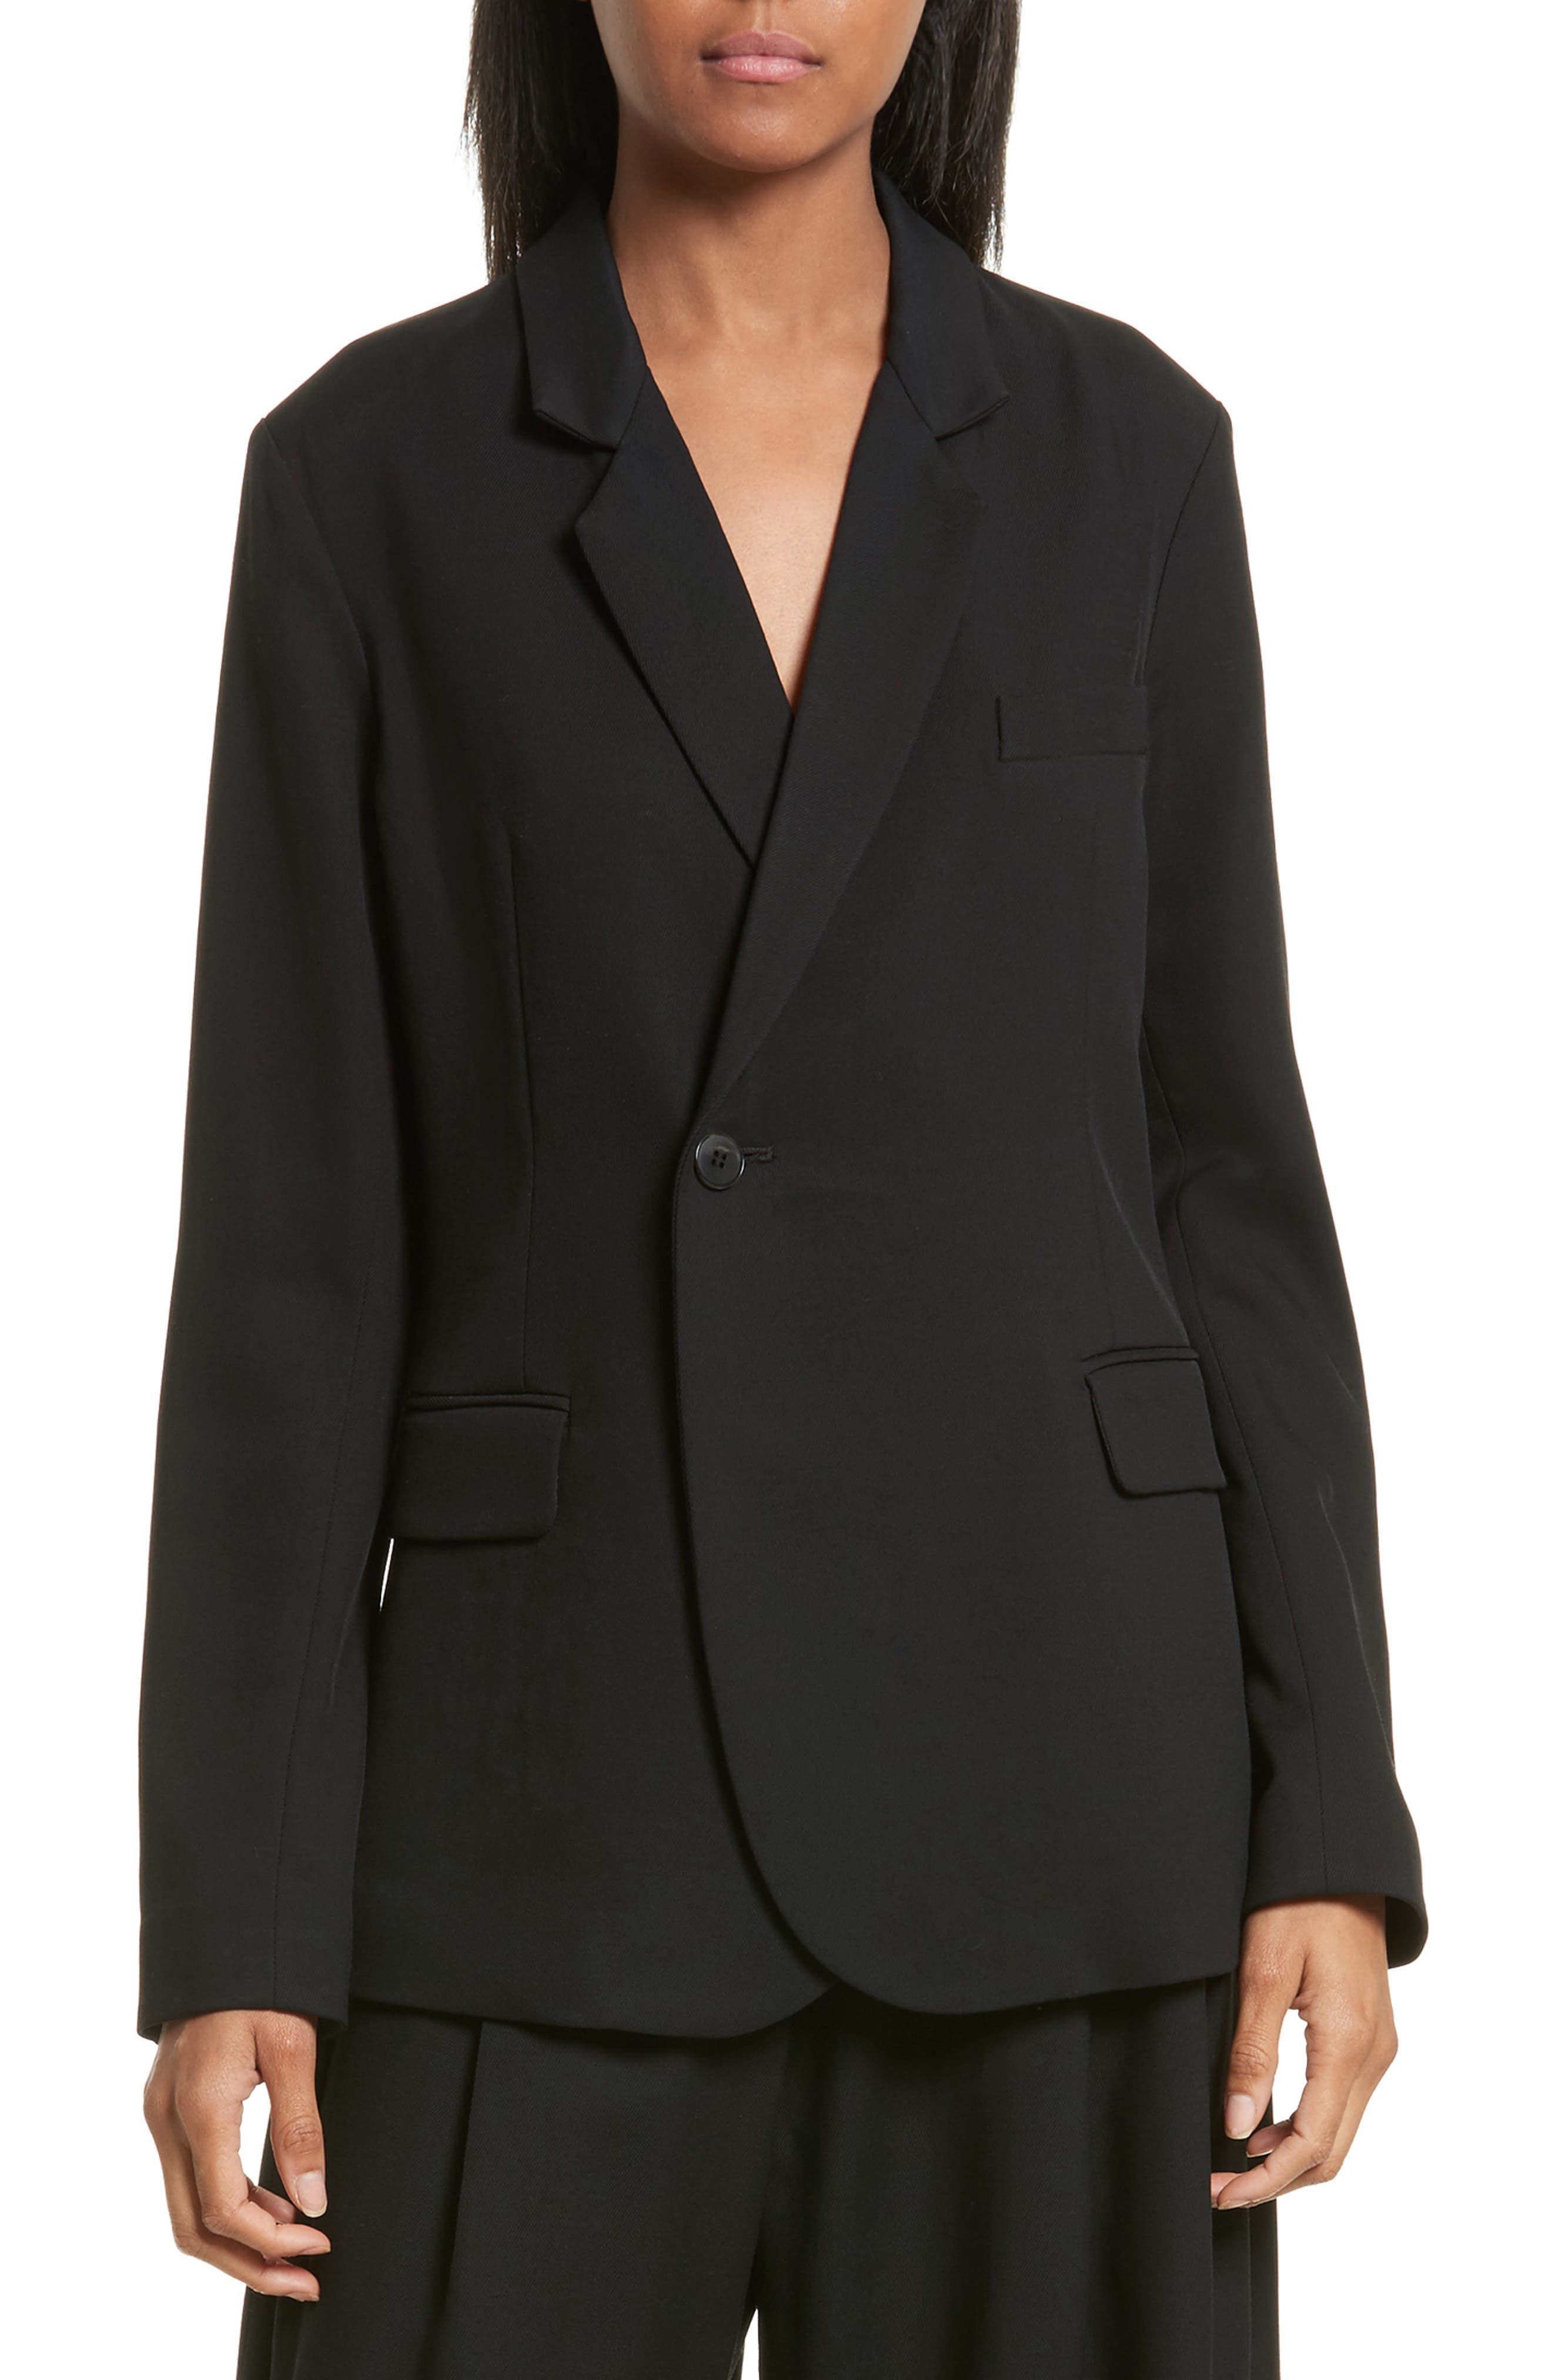 Alternate Image 1 Selected - Nili Lotan Classon Jacket